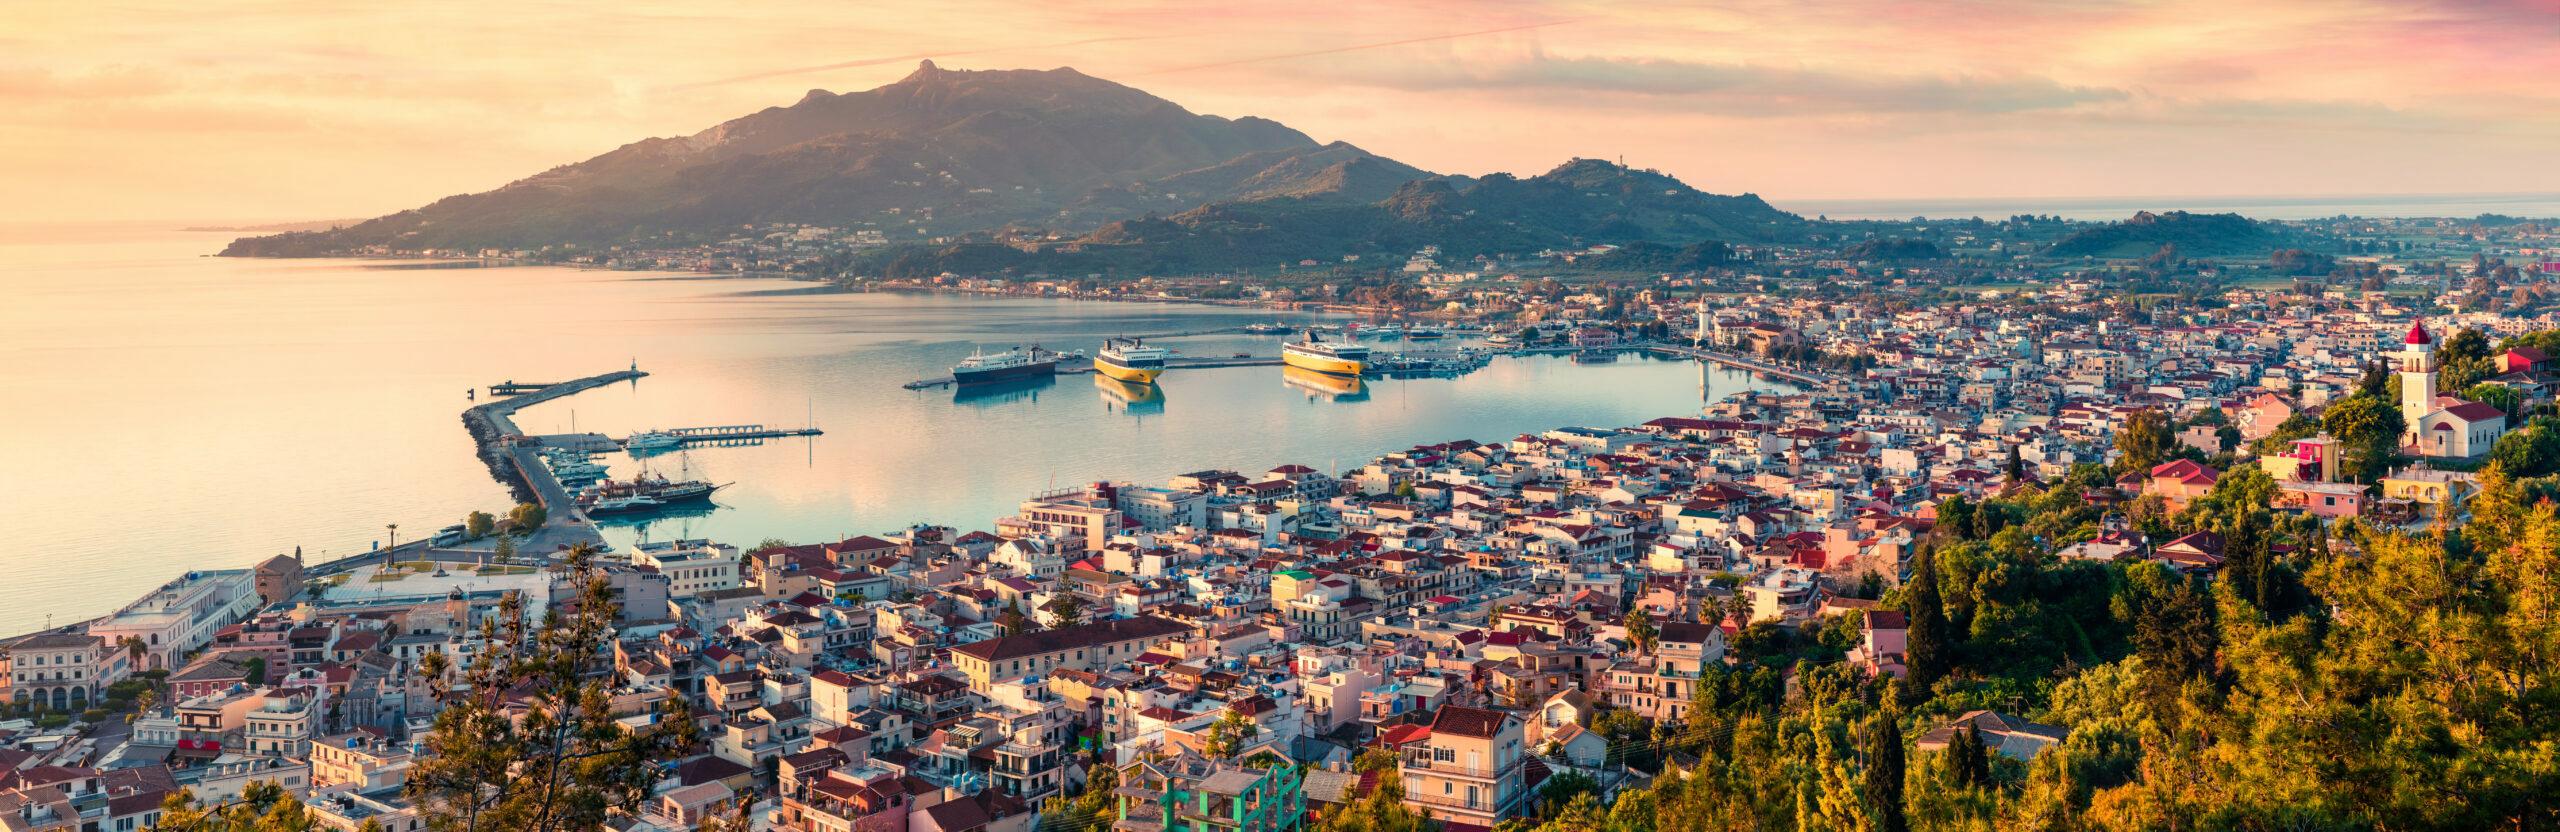 Zakynthos: The elegant city of the Ionian Sea